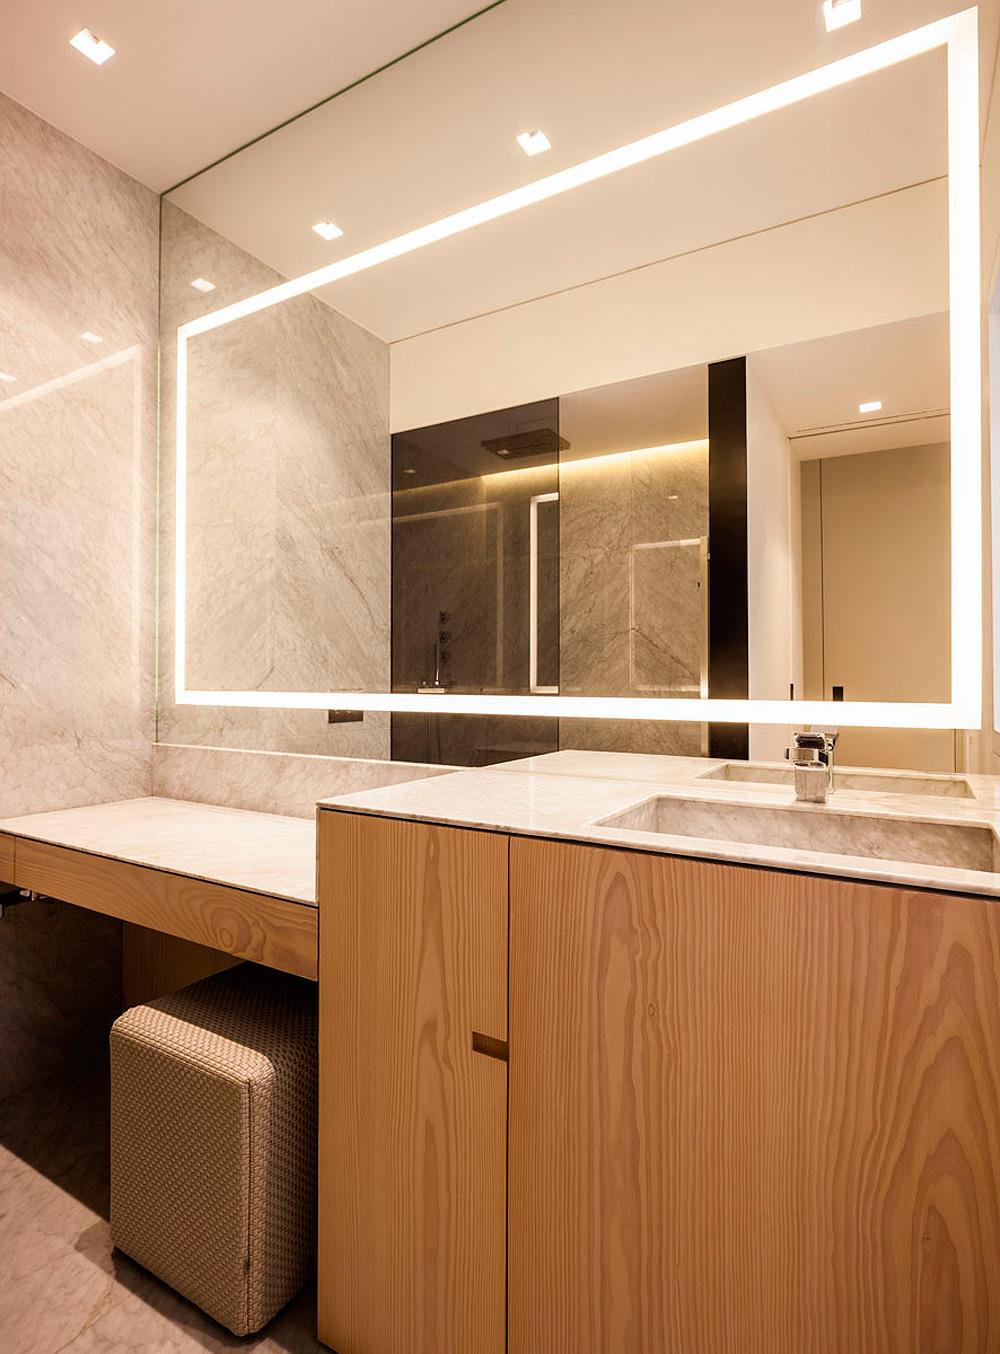 apartamento-en-sevilla-francesc-rife (15)